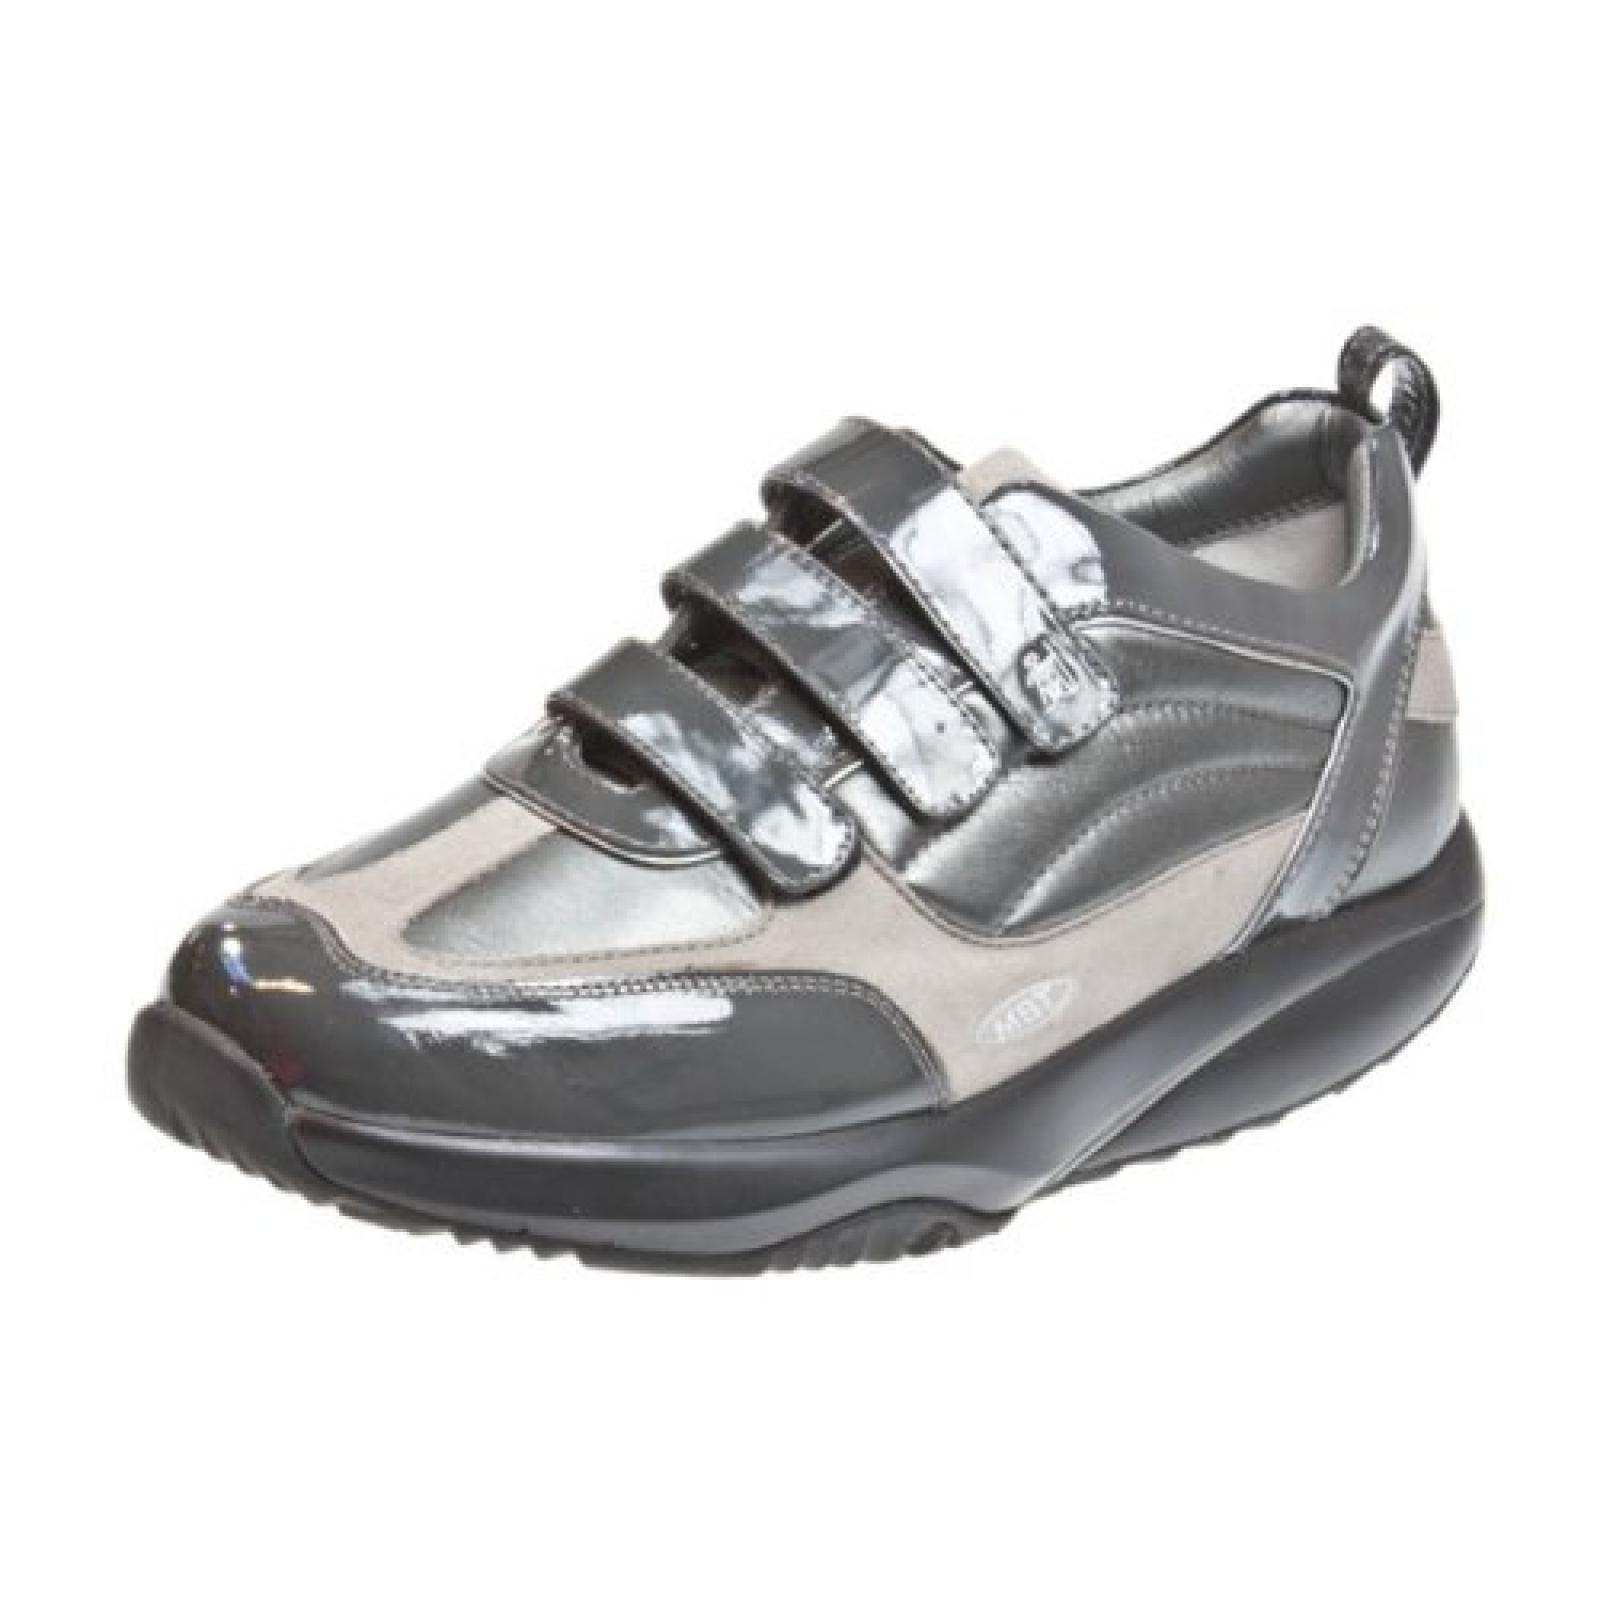 MBT Nama Leder Grau Damen Velcro Strap Sport Sneakers